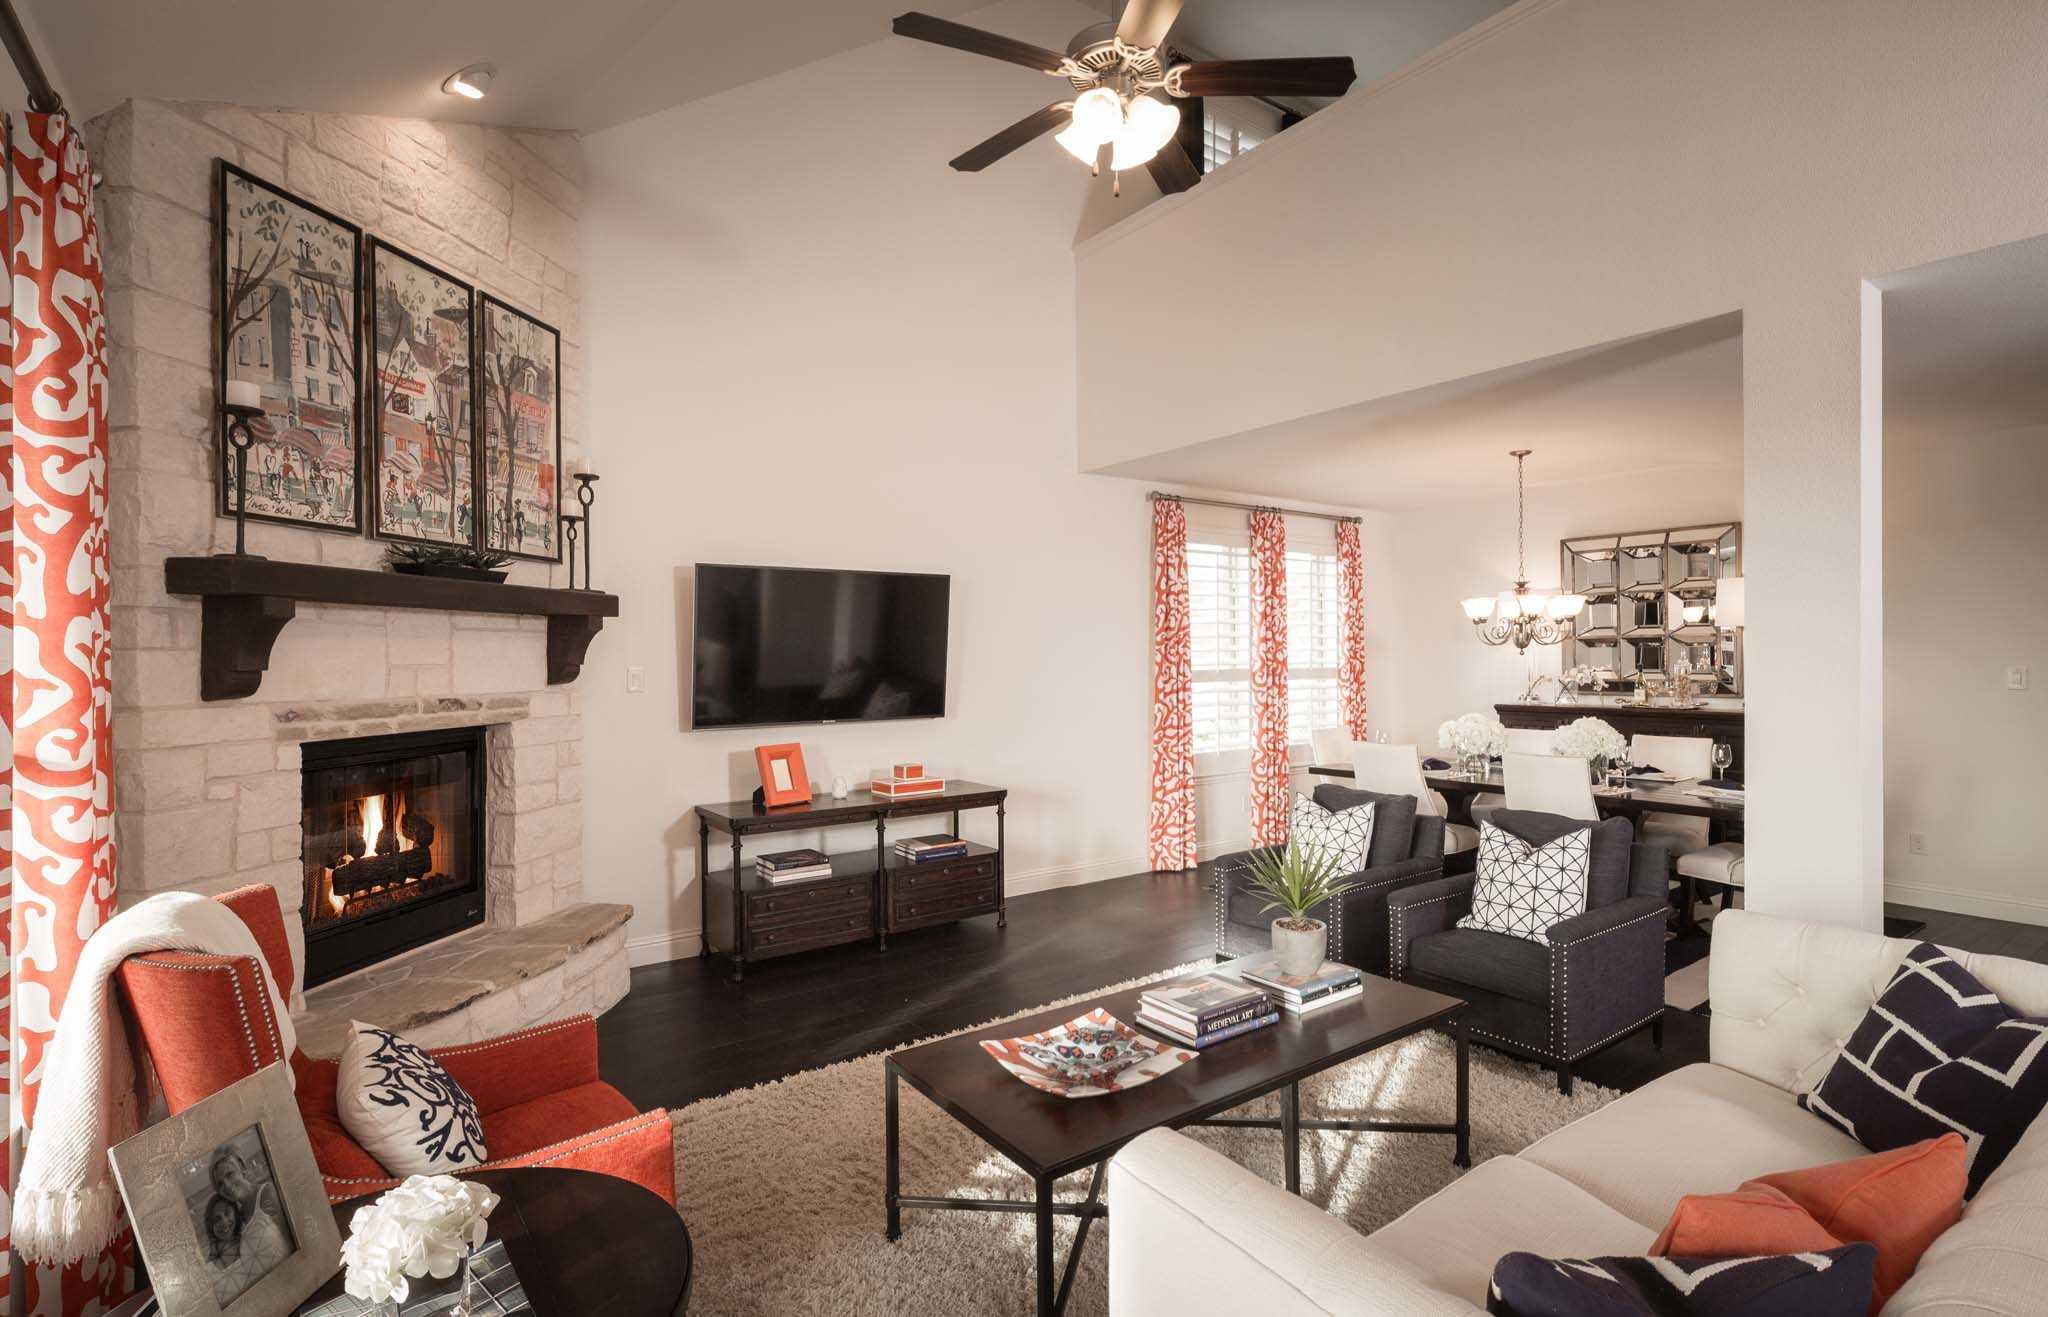 Representative Photo. New Home Plan 207 in Spring  TX 77386